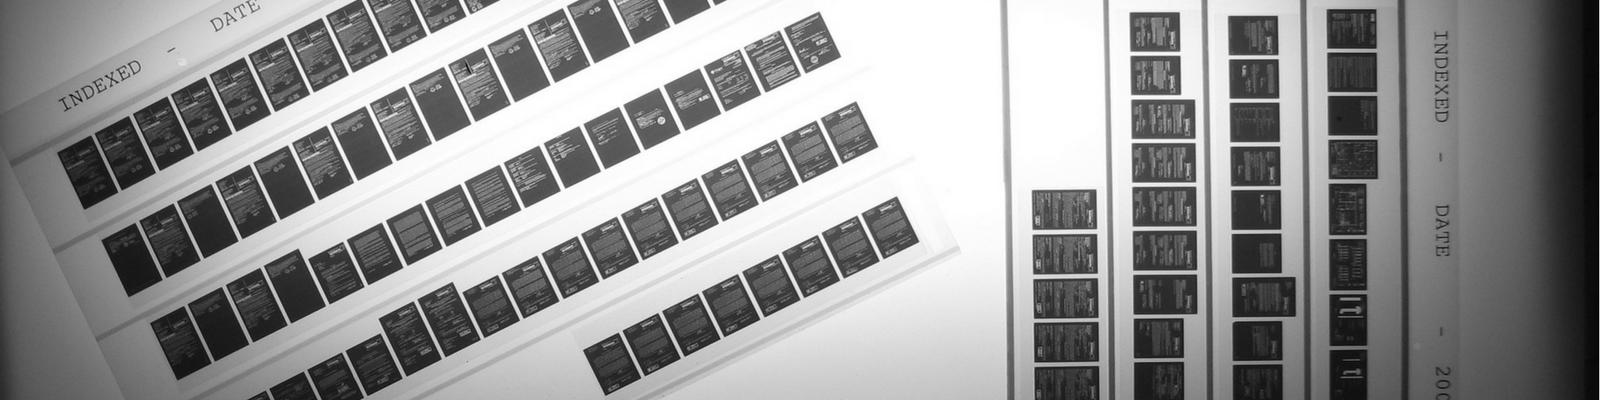 Microfiche Duplication Services